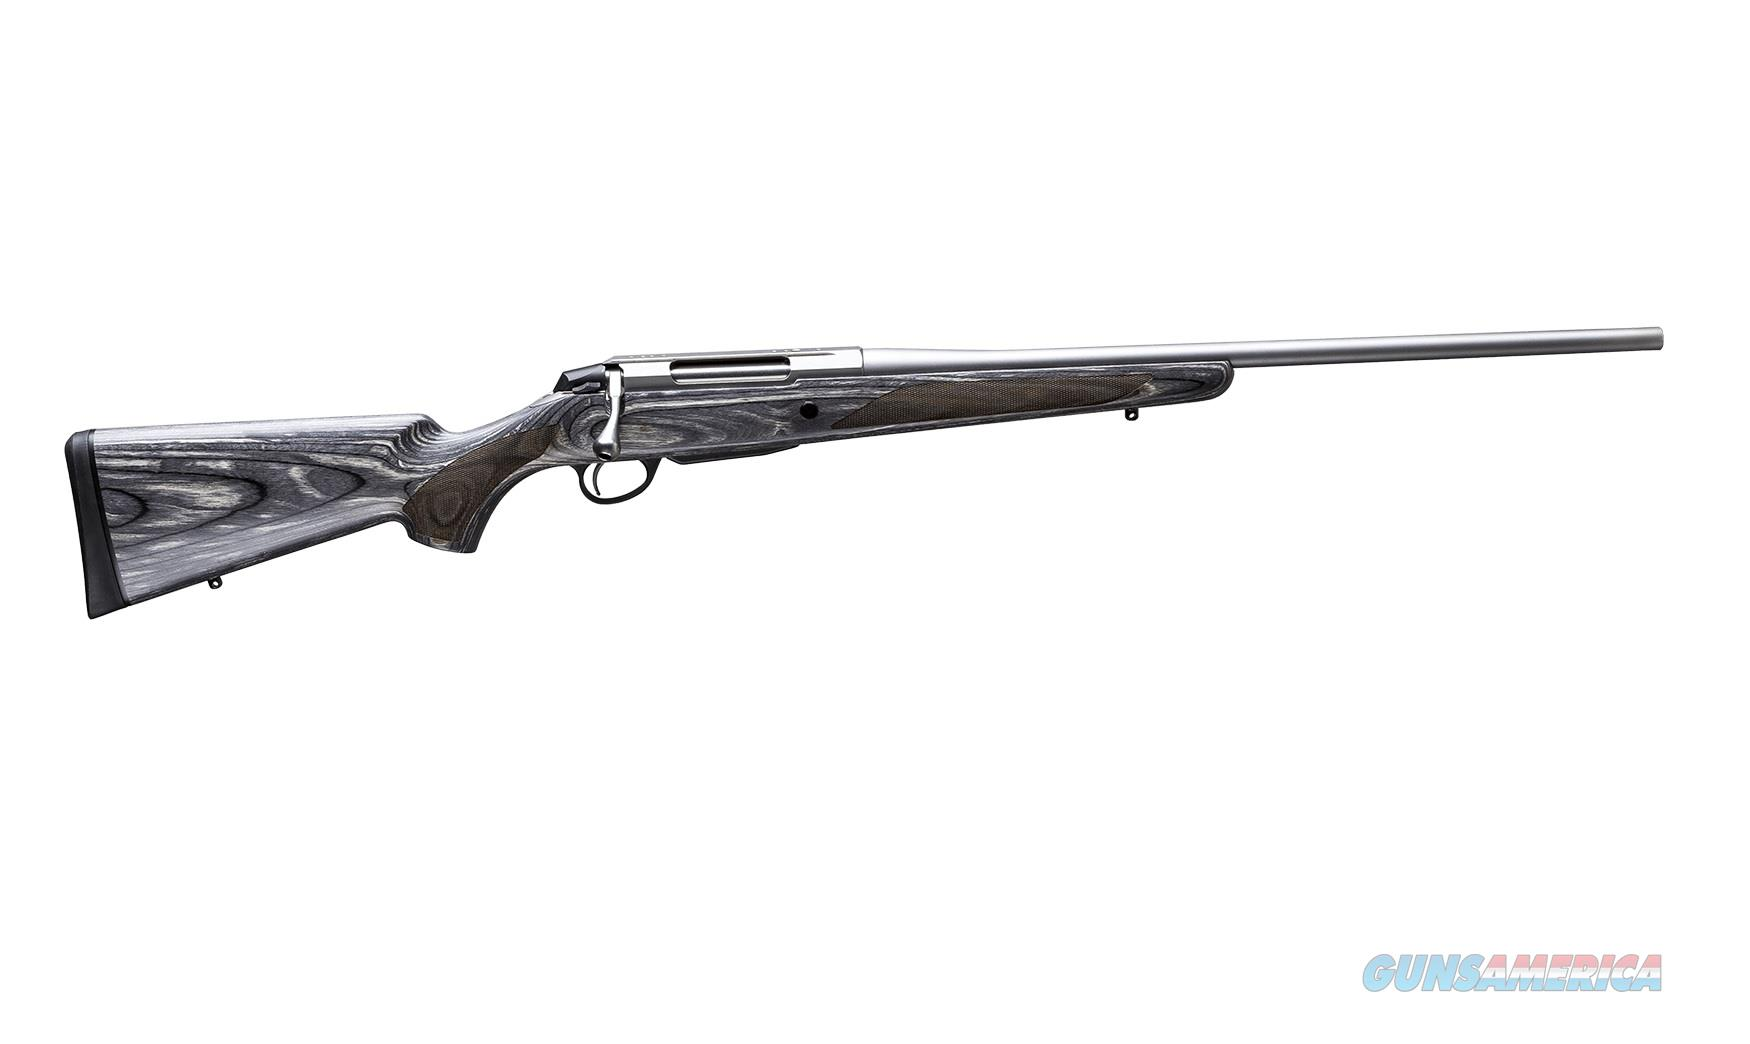 Tikka T3x Laminated Stainless .308 Win. JRTXG316   Guns > Rifles > Tikka Rifles > T3